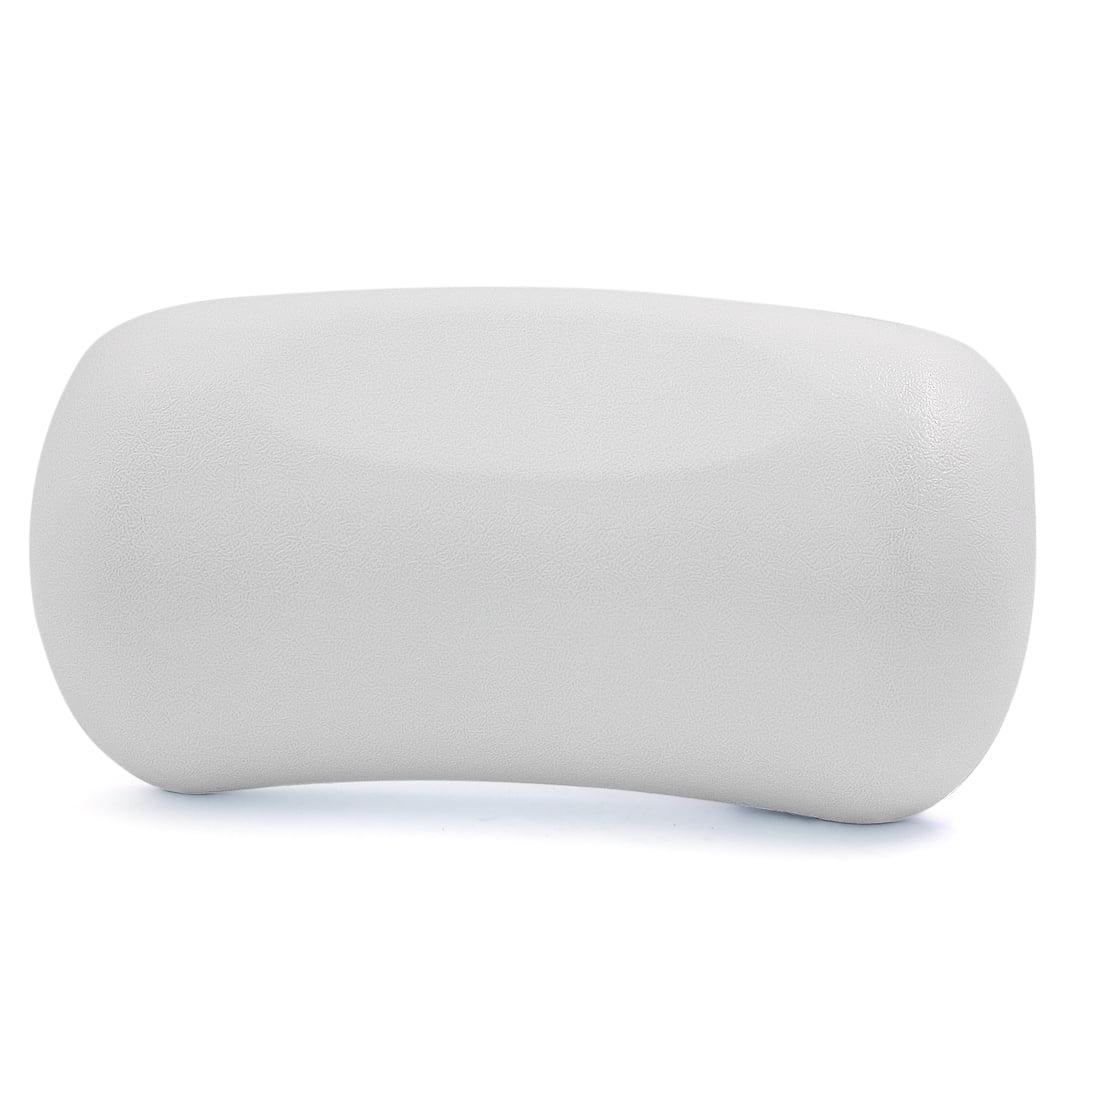 White Neck Back Support Headrest Tub Bath Spa Pillow Cushion w/ 2 ...